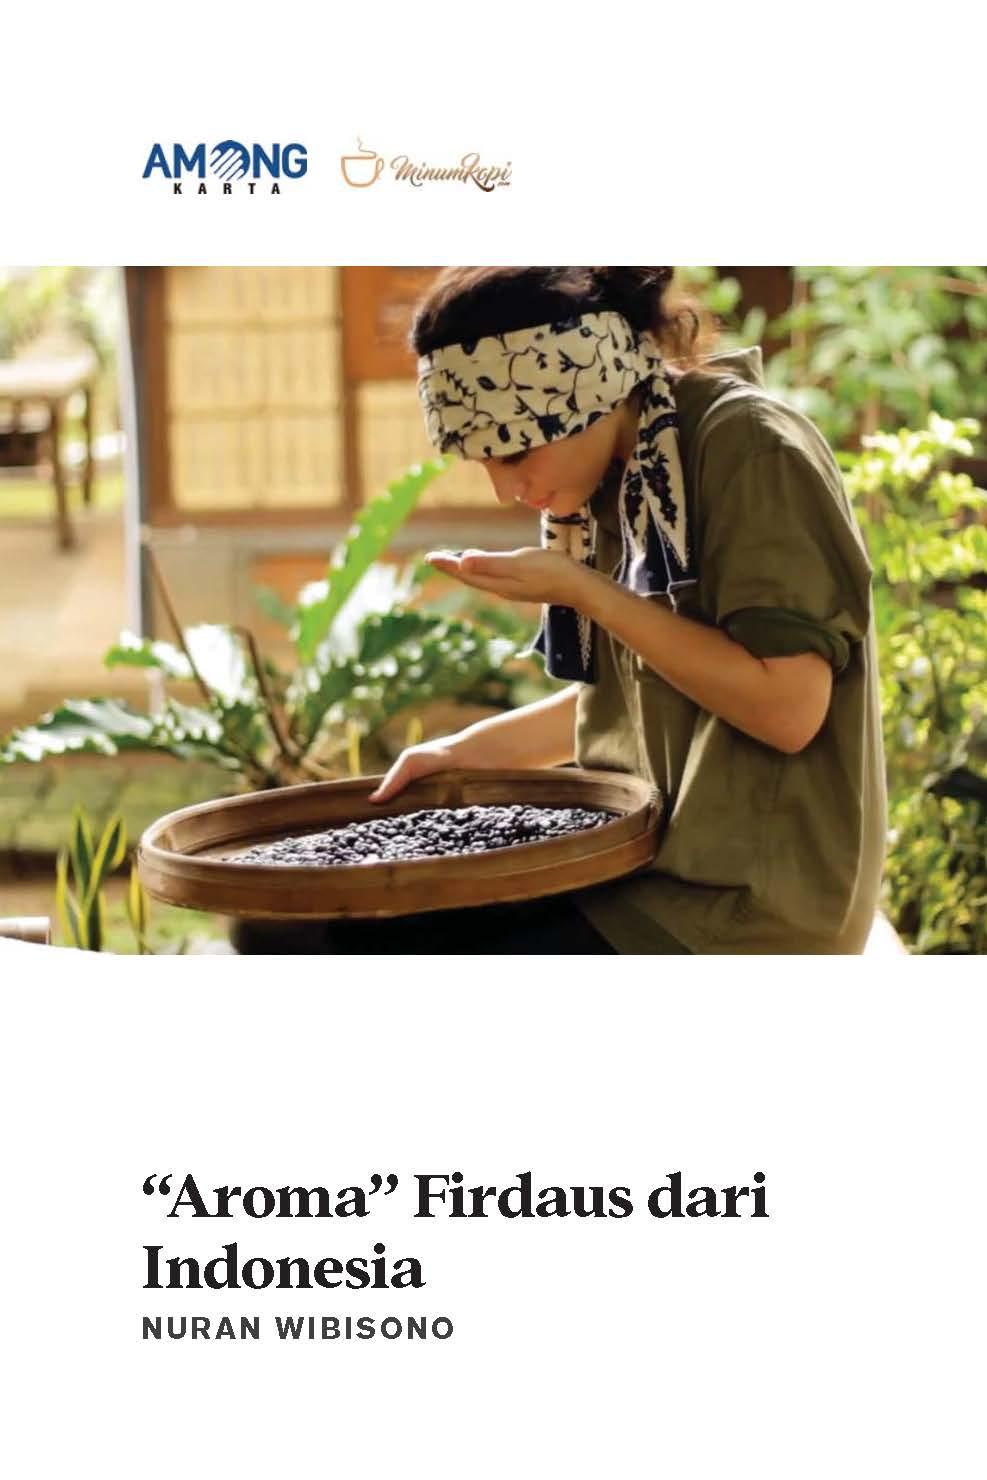 Aroma firdaus dari Indonesia [sumber elektronis]